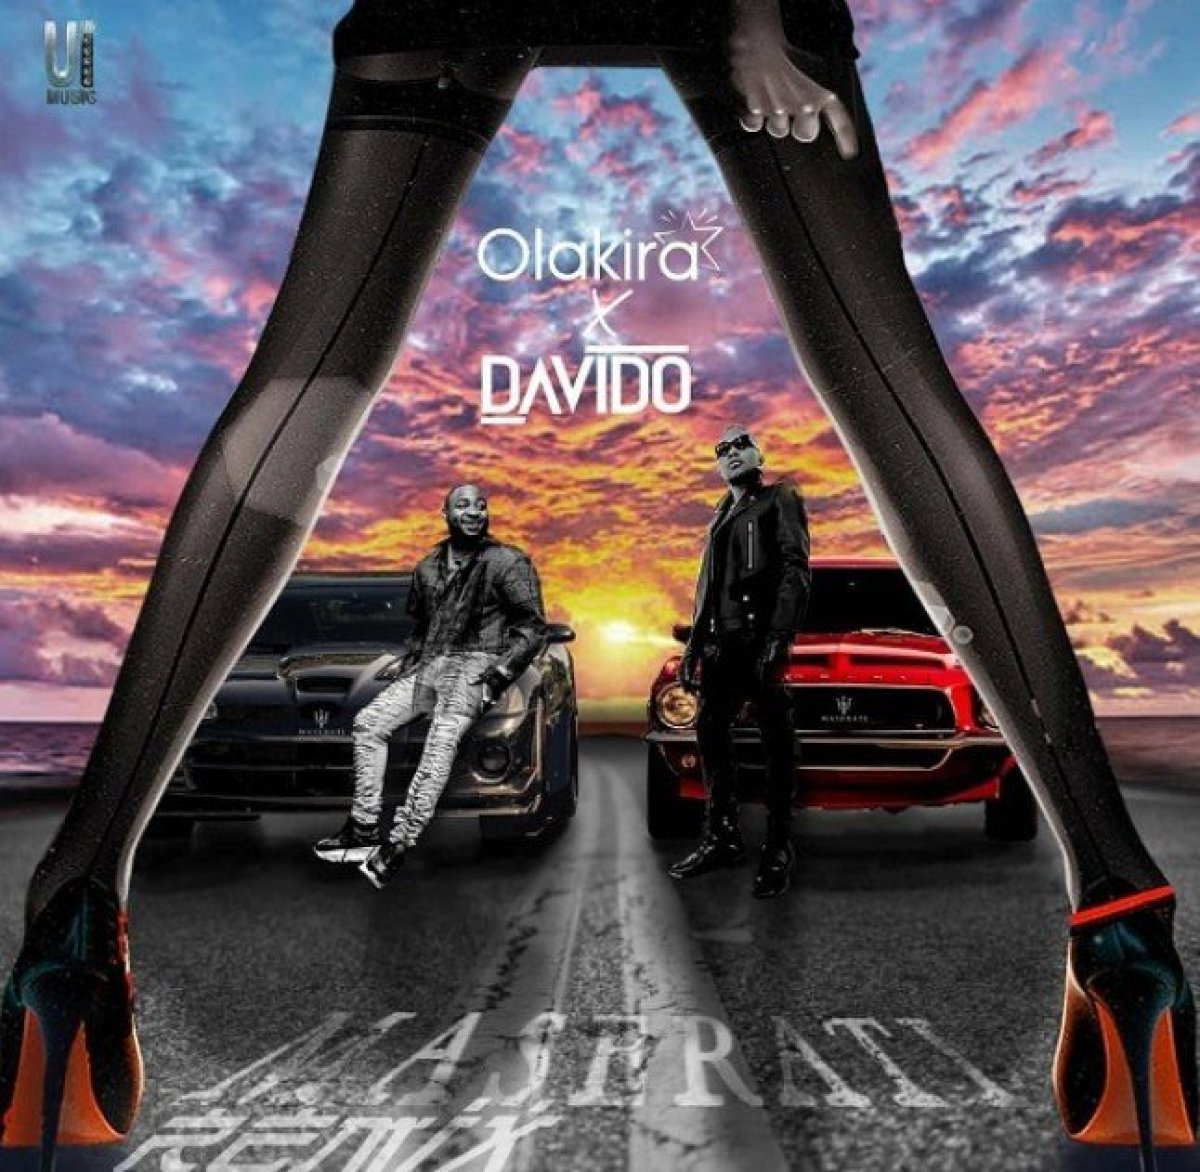 Olakira – In My Maserati MP3 DOWNLOAD FREE